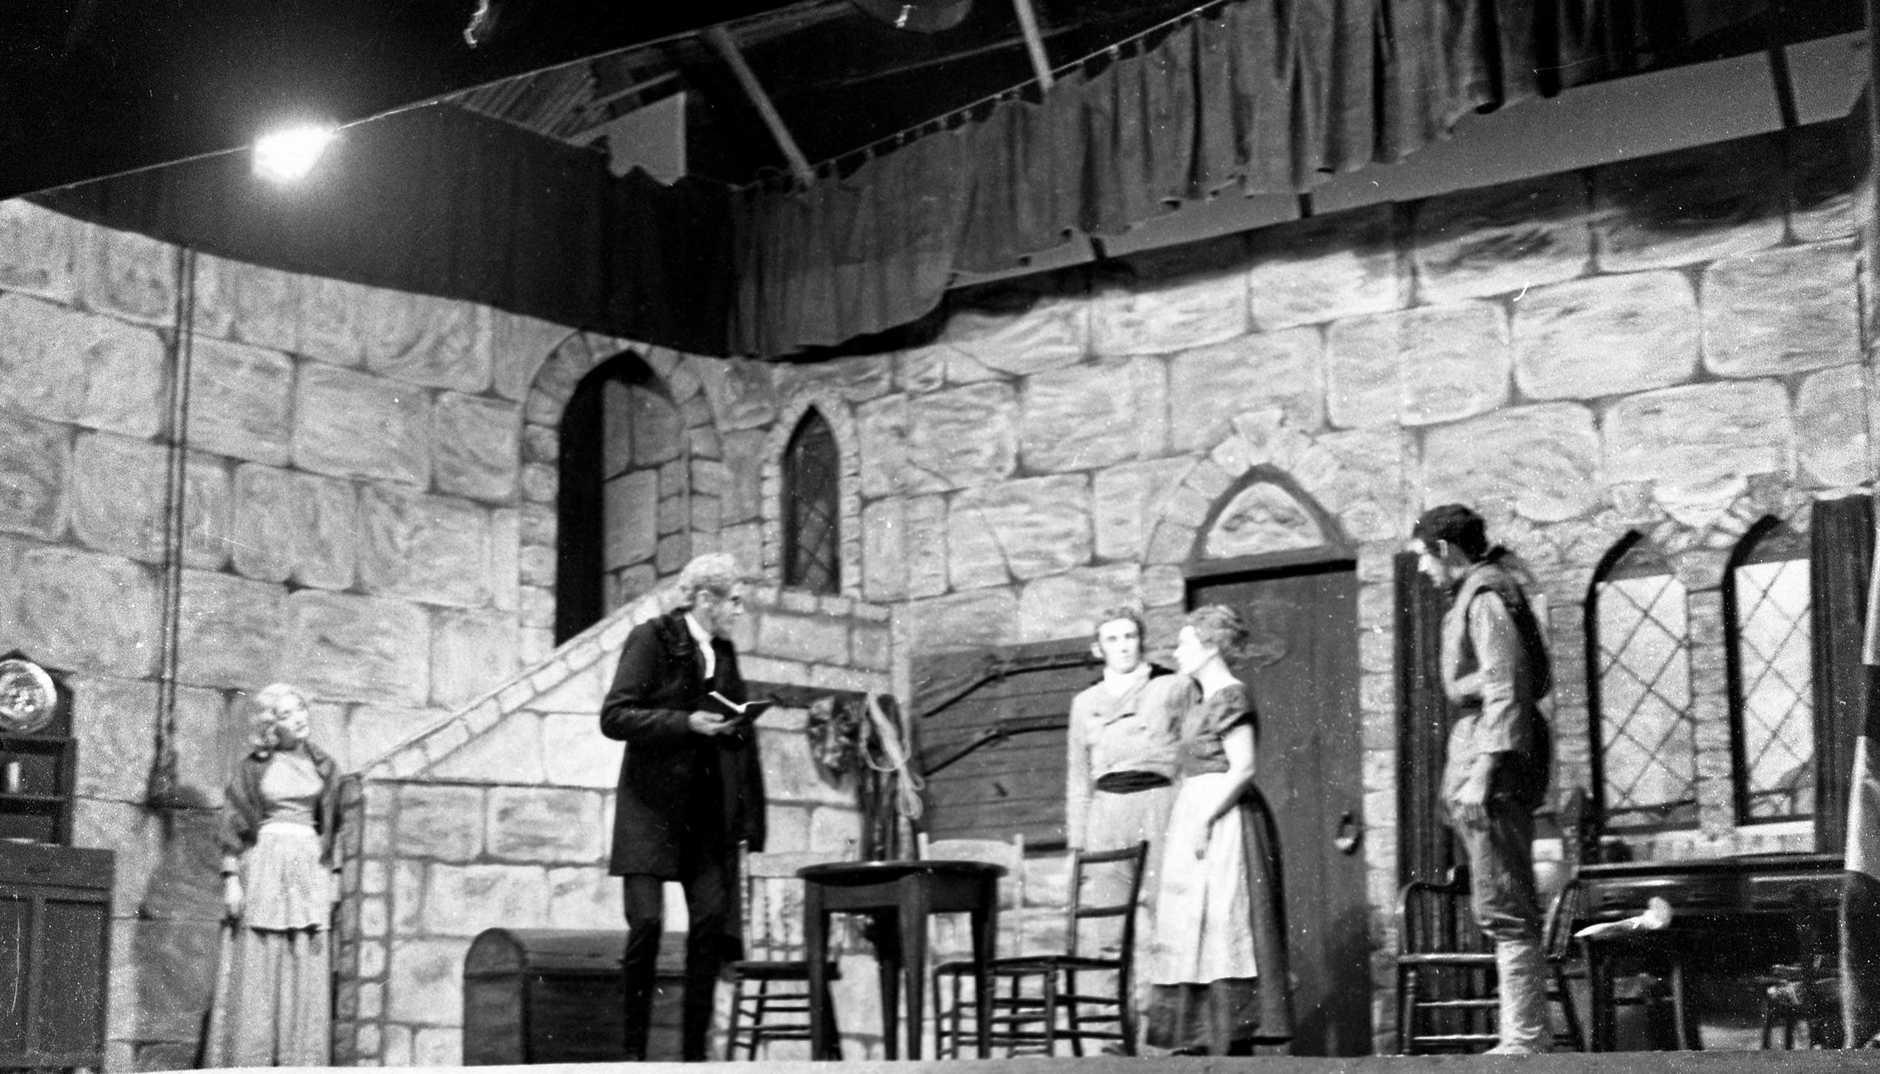 M869250 - Nambour Amateur Theatrical Society members performing the play 'Granite', Nambour, July 1959.